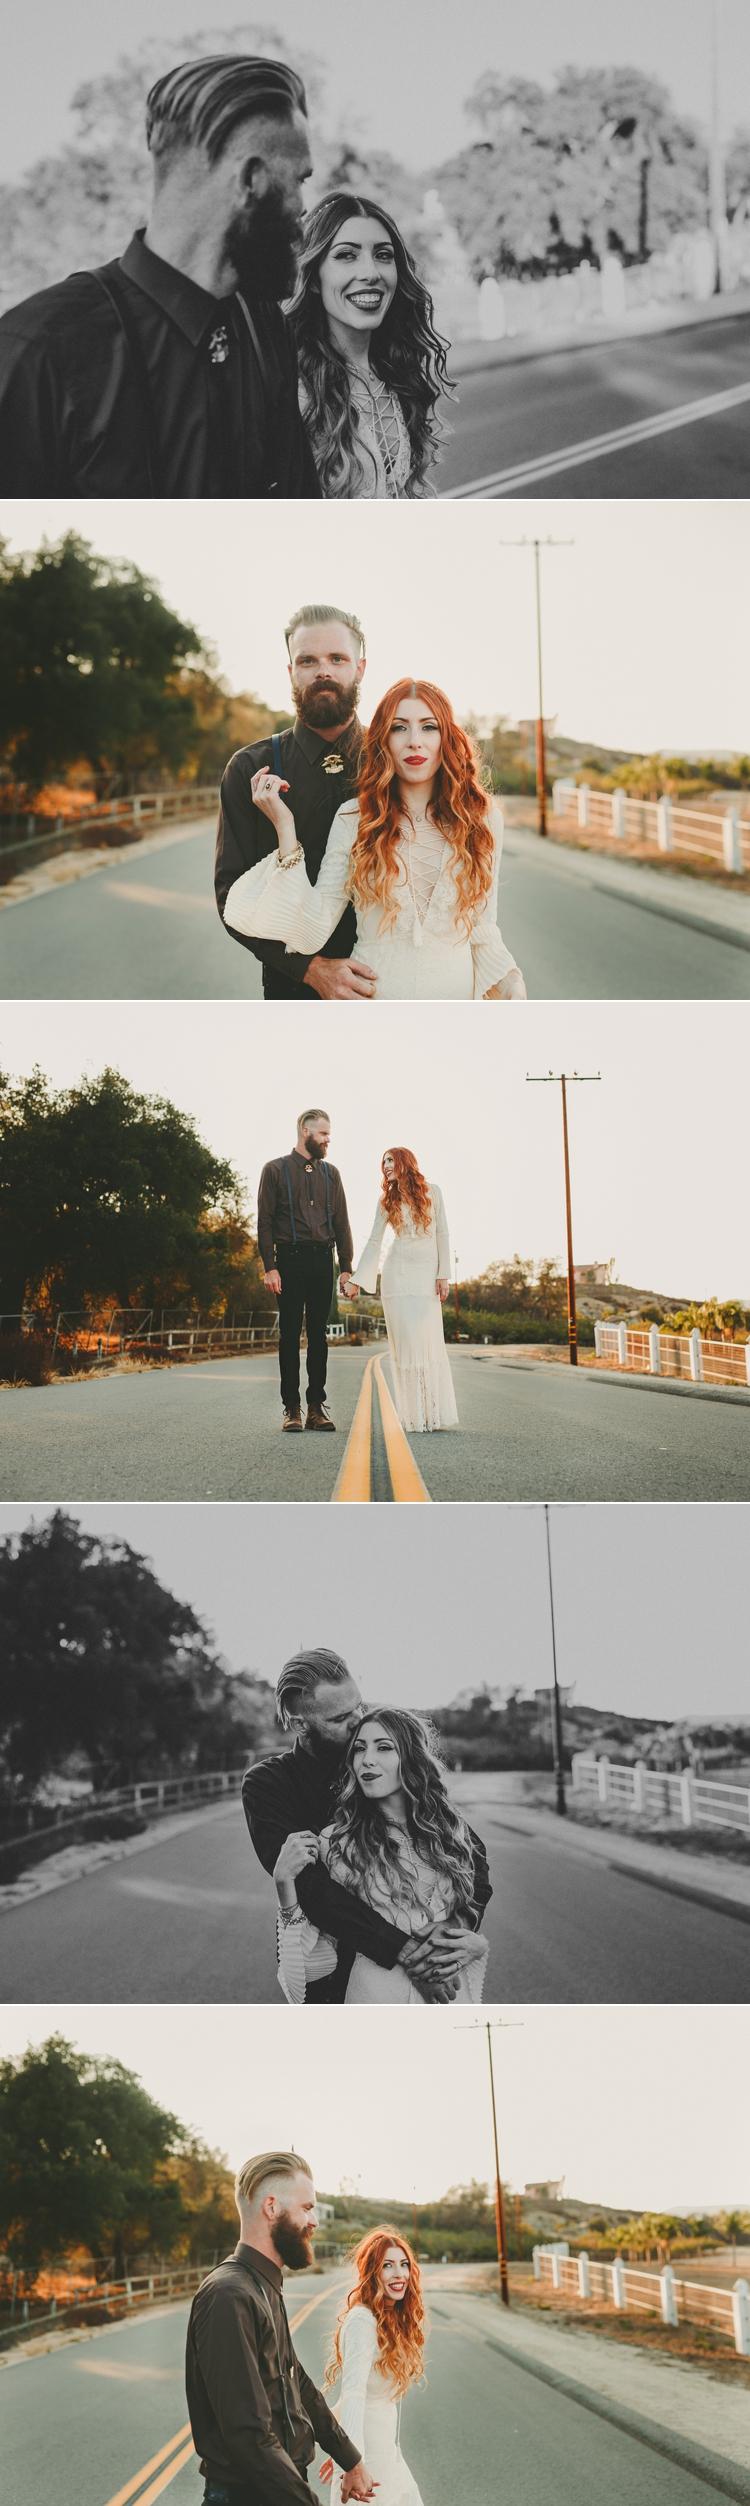 woodstock-inspired-wedding-photos-24